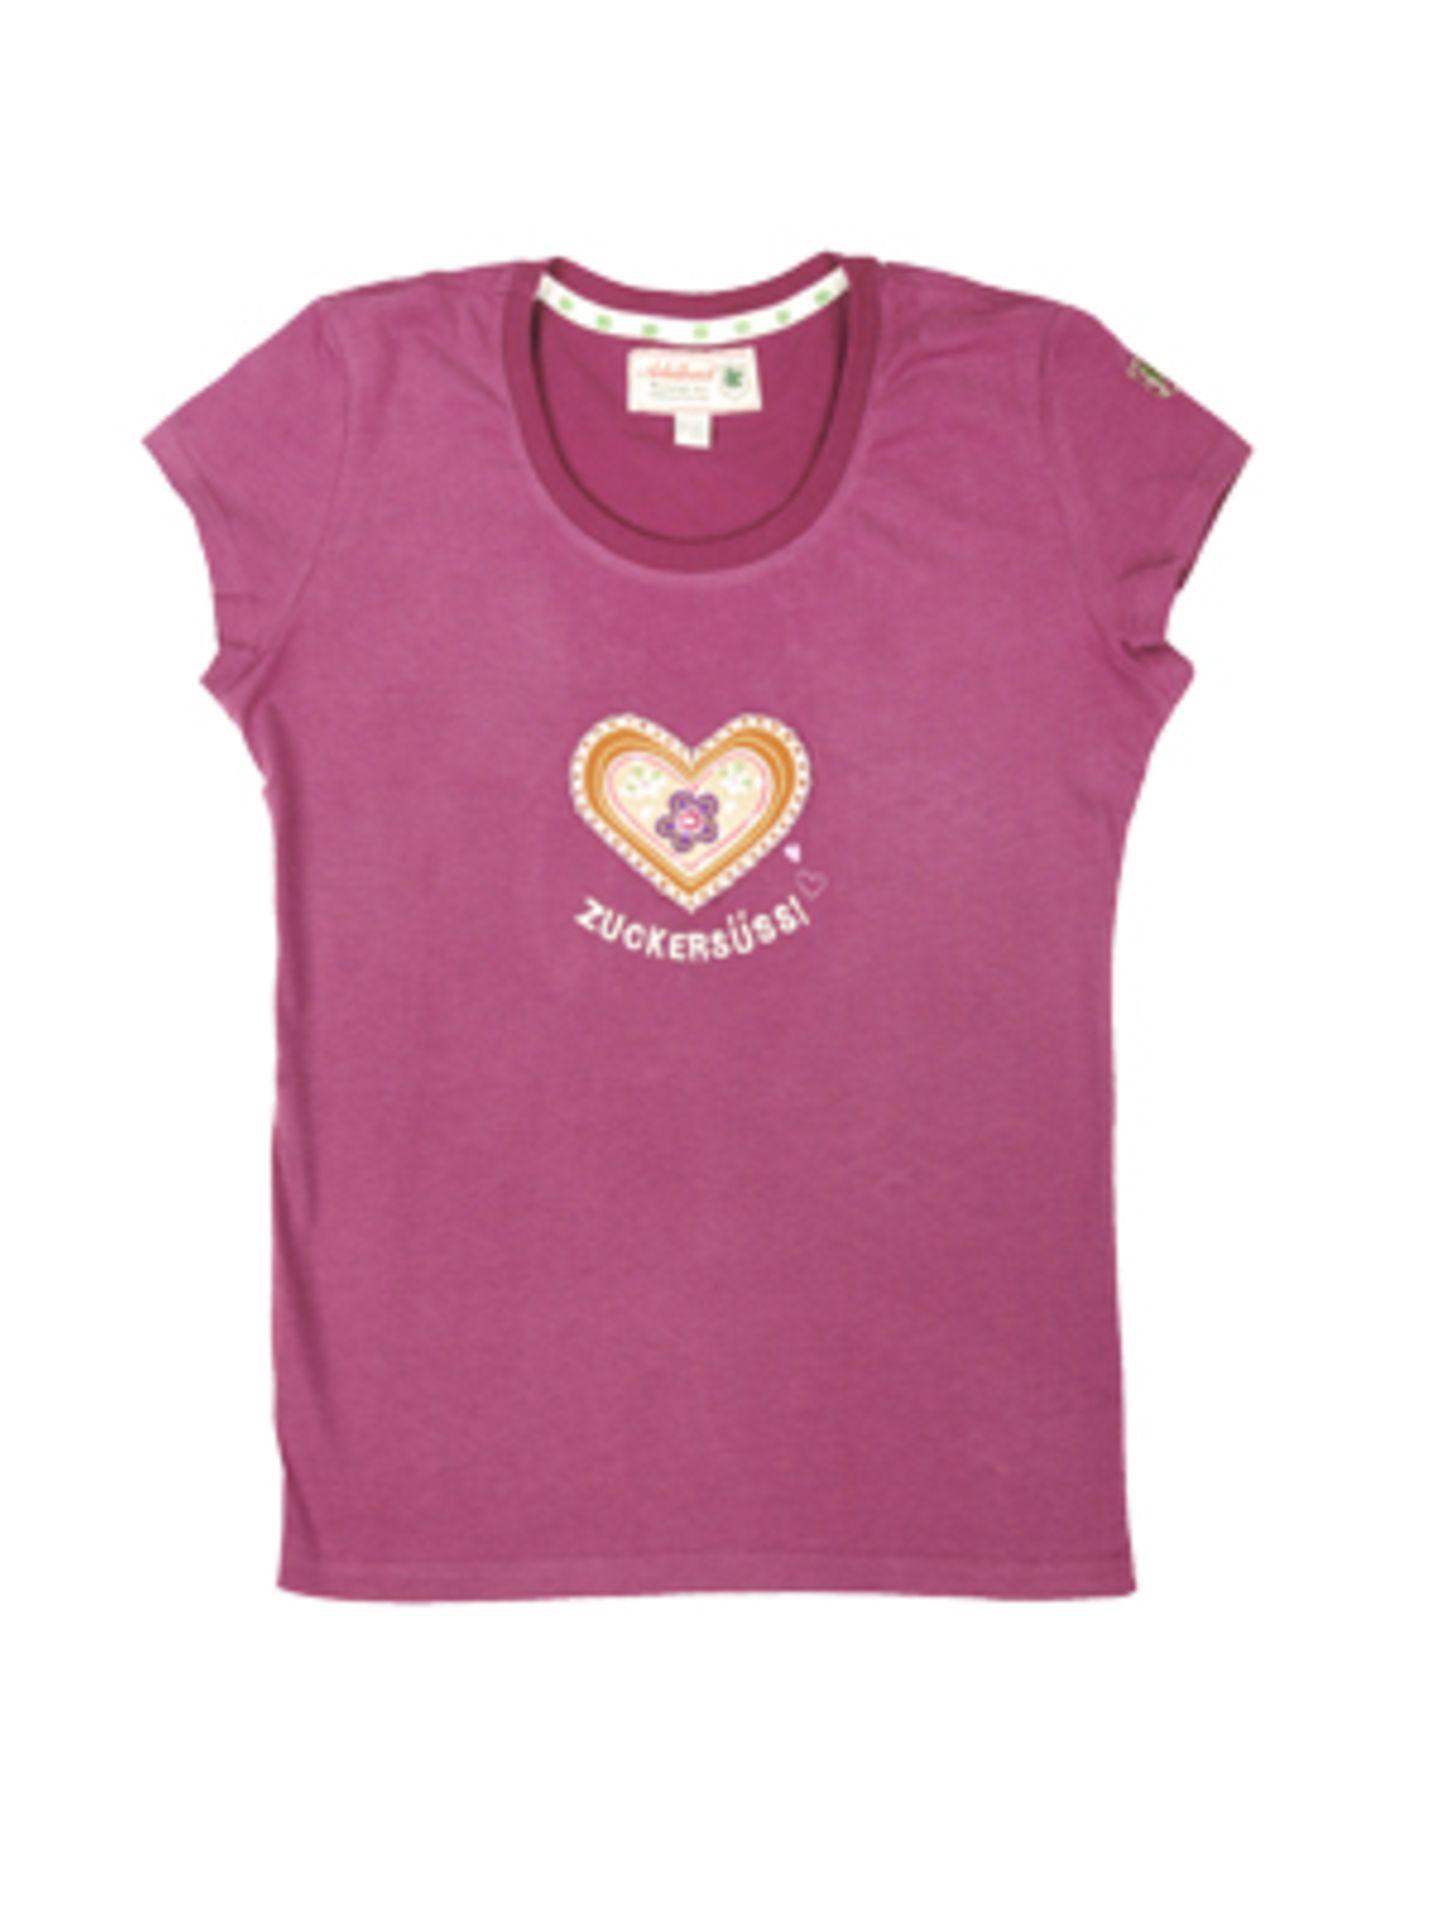 "T-Shirt ""ZUCKERSÜSS!"" aus der Adelheid Glückswerkstatt, um 30 Euro."